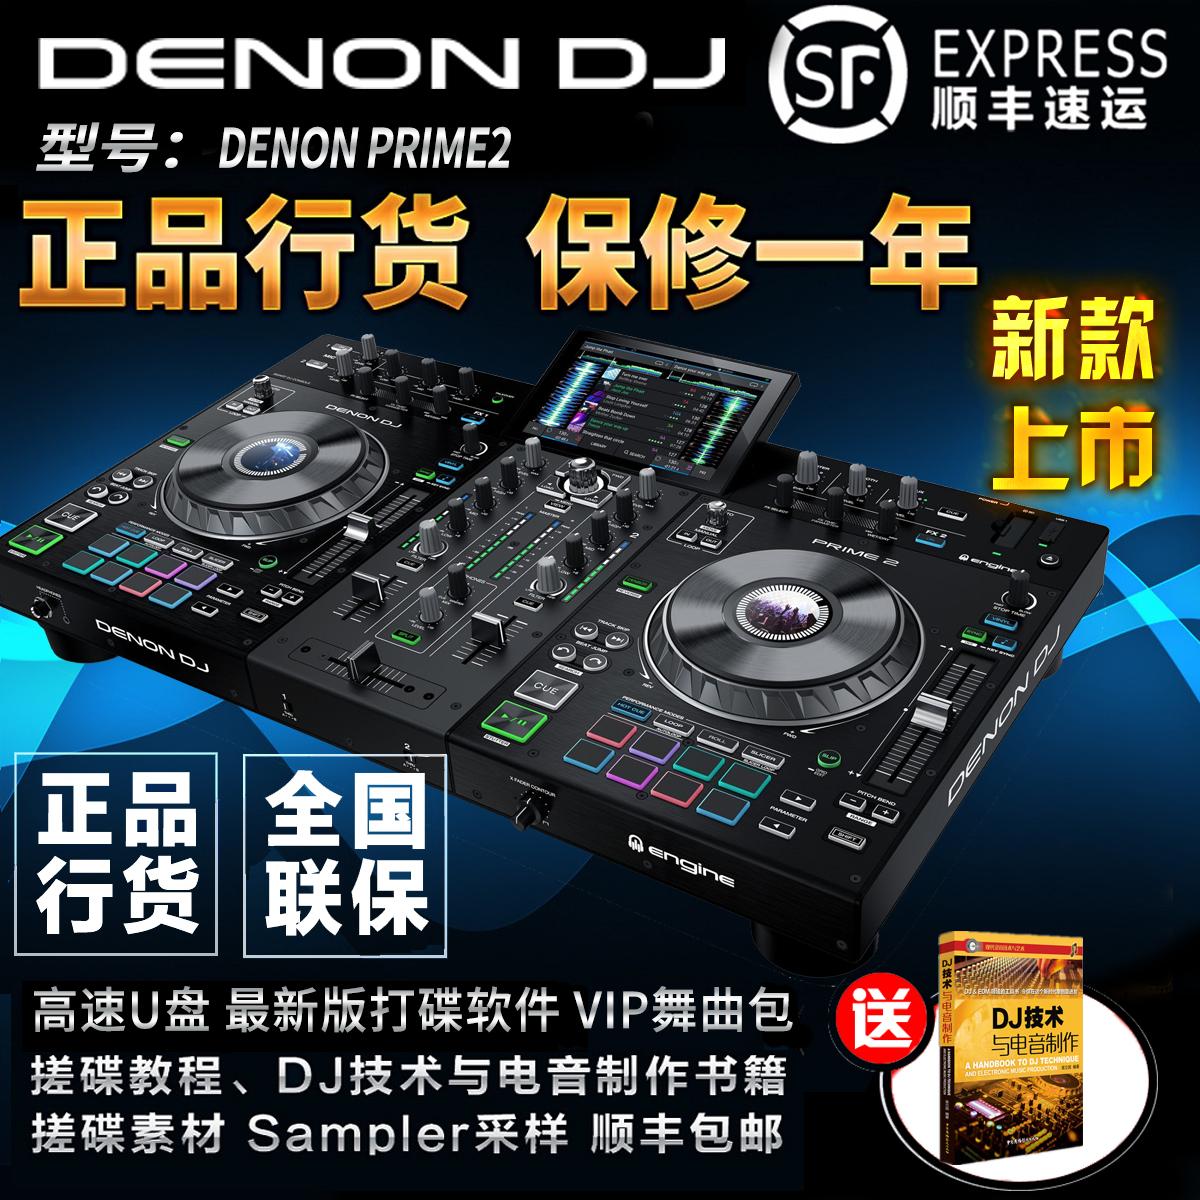 Denon DJ 天龙 Prime 2 DJ打碟机控制器 U盘一体机